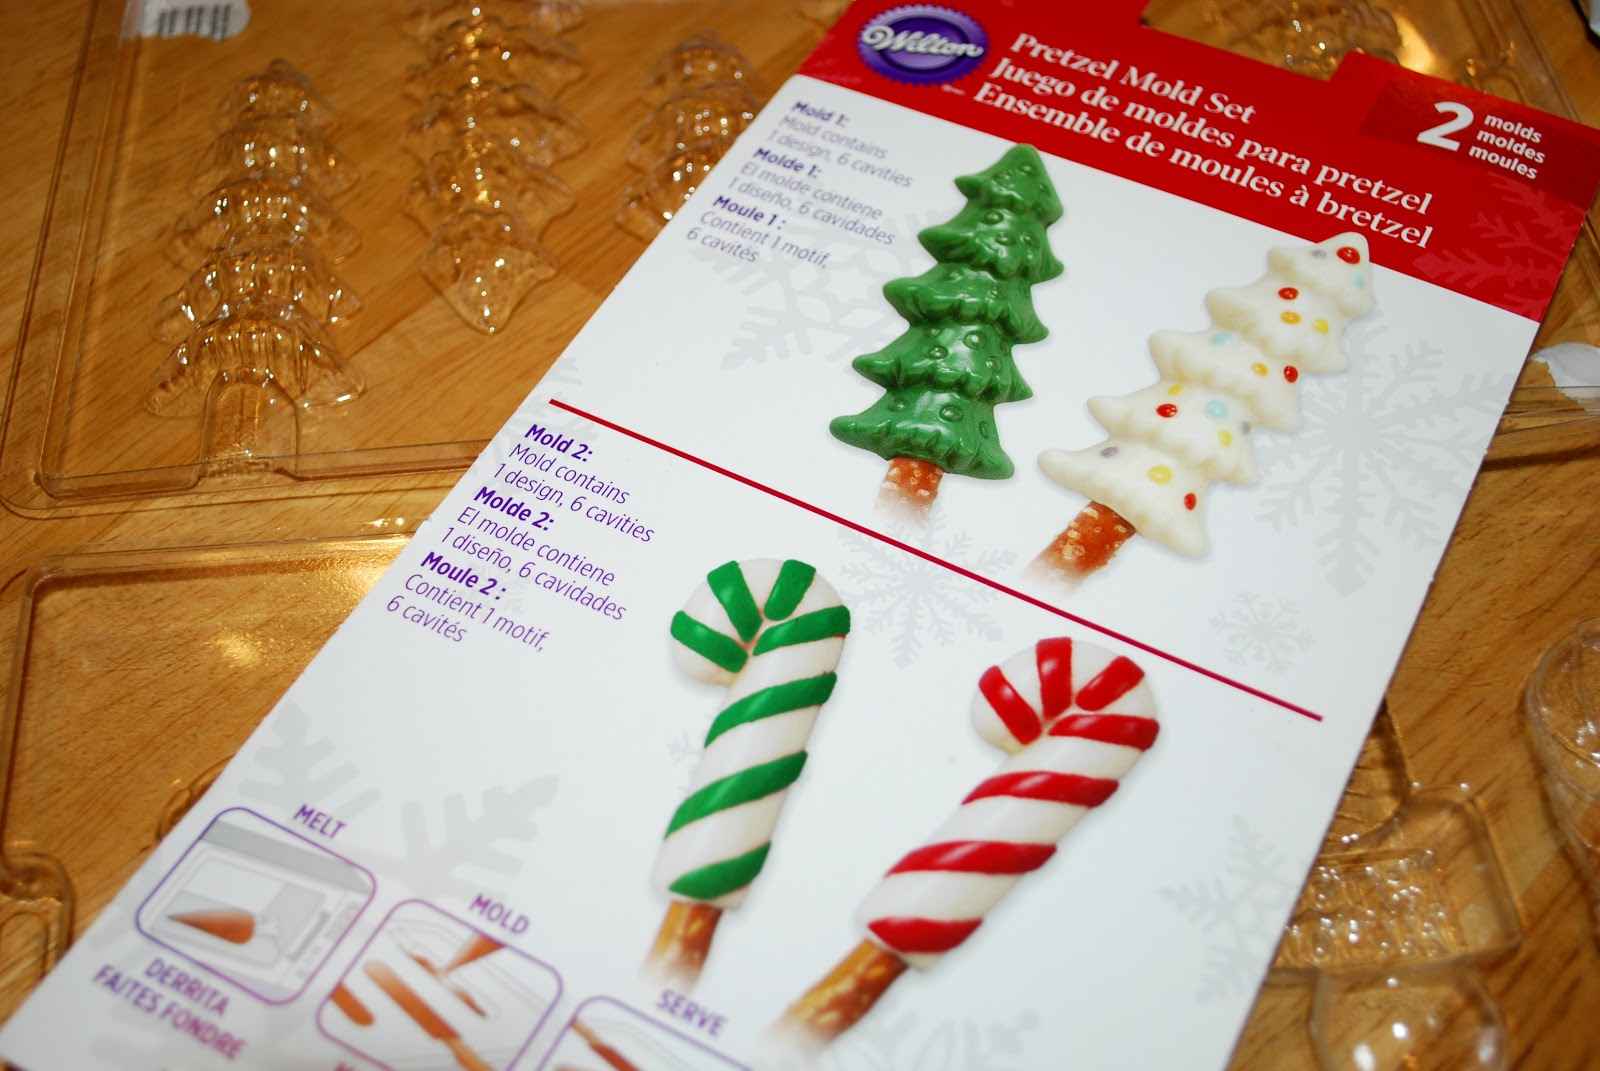 christmas chocolate covered pretzels - Christmas Chocolate Covered Pretzels